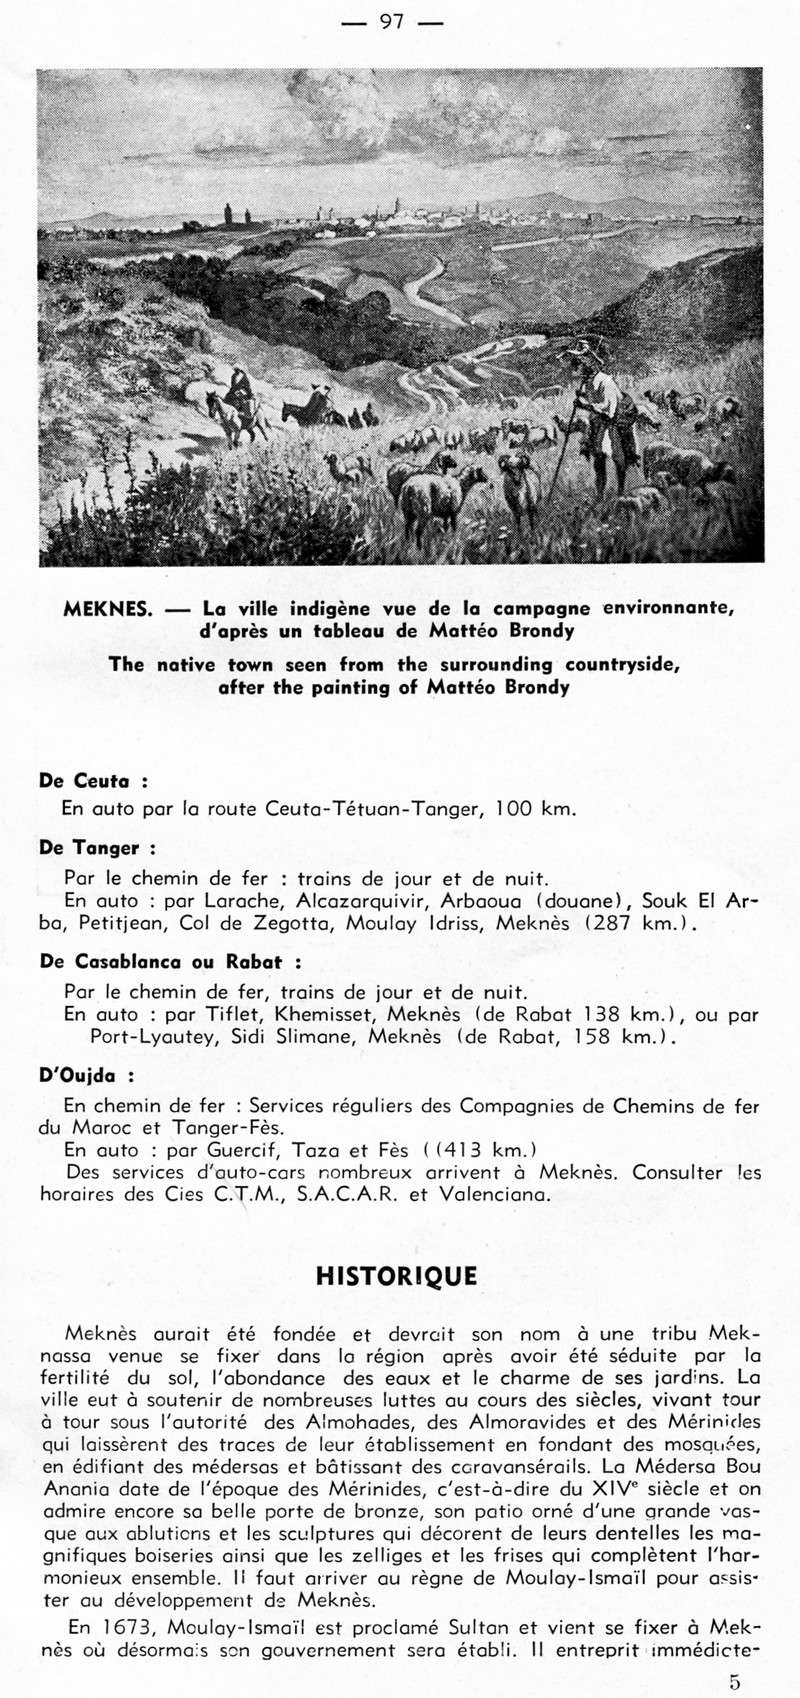 GUIDE GENERAL du MAROC - Page 4 26-gui10